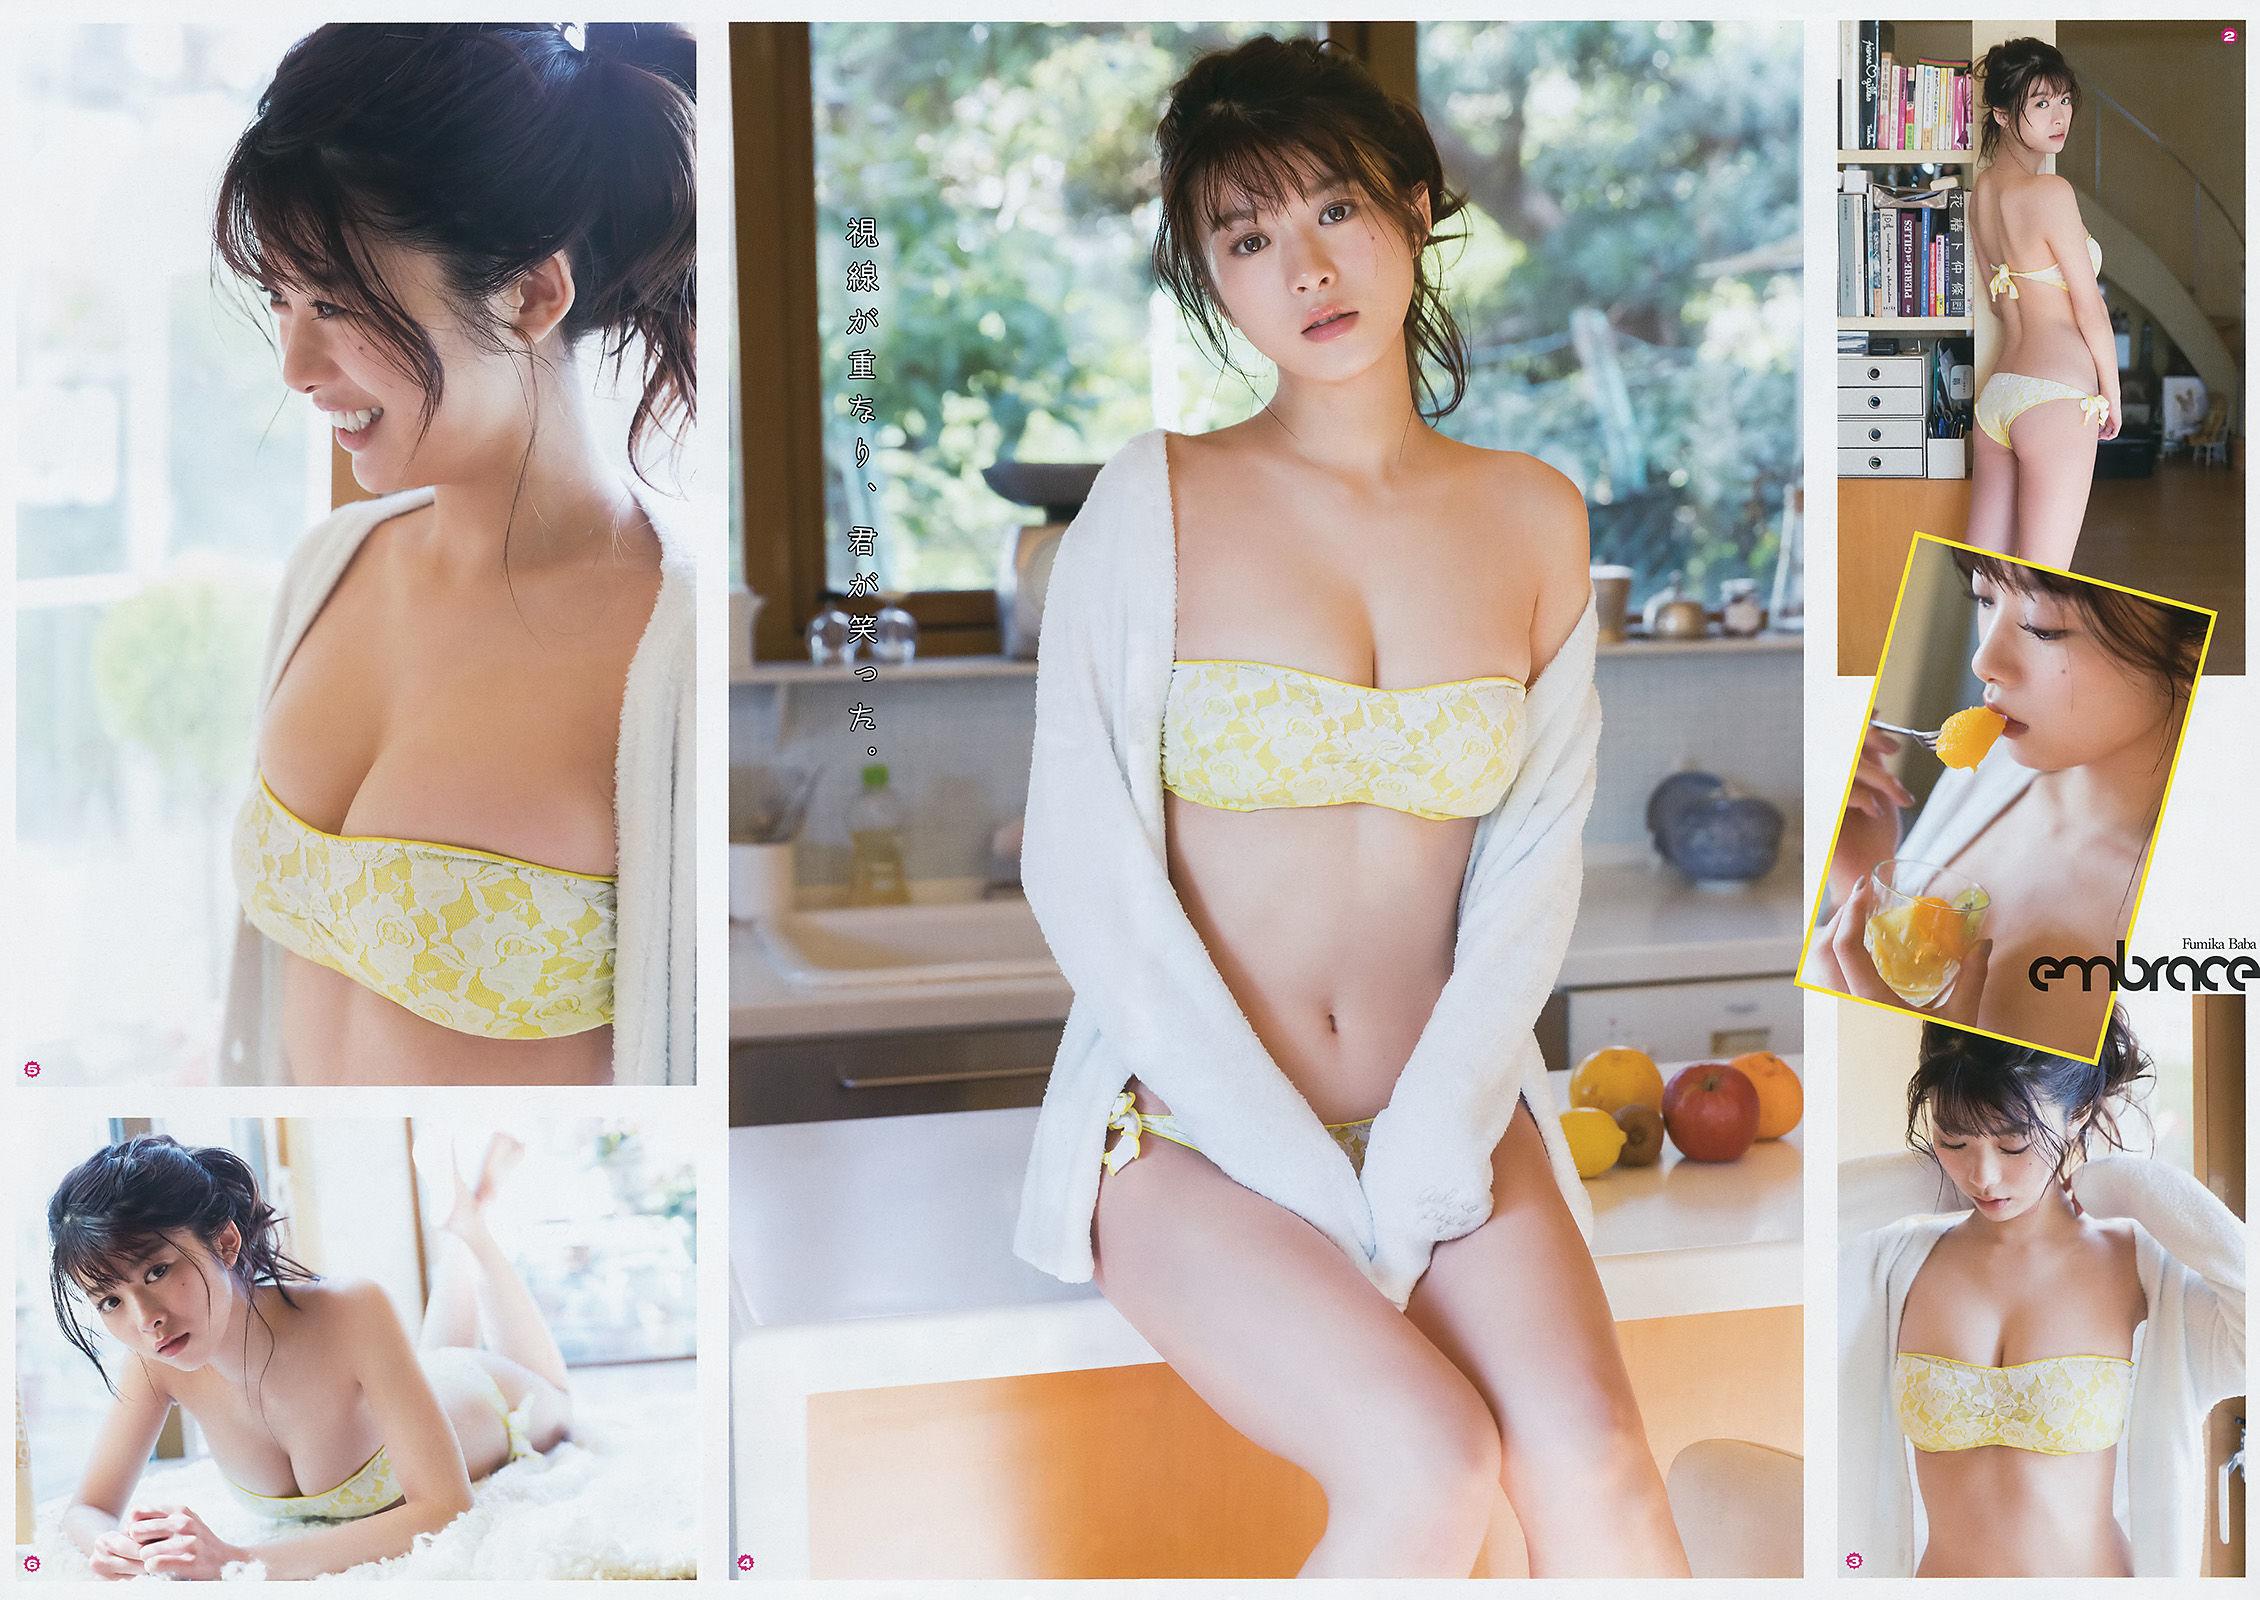 VOL.353 [Young Gangan]女神惊艳:马场富美加超高清写真套图(20P)